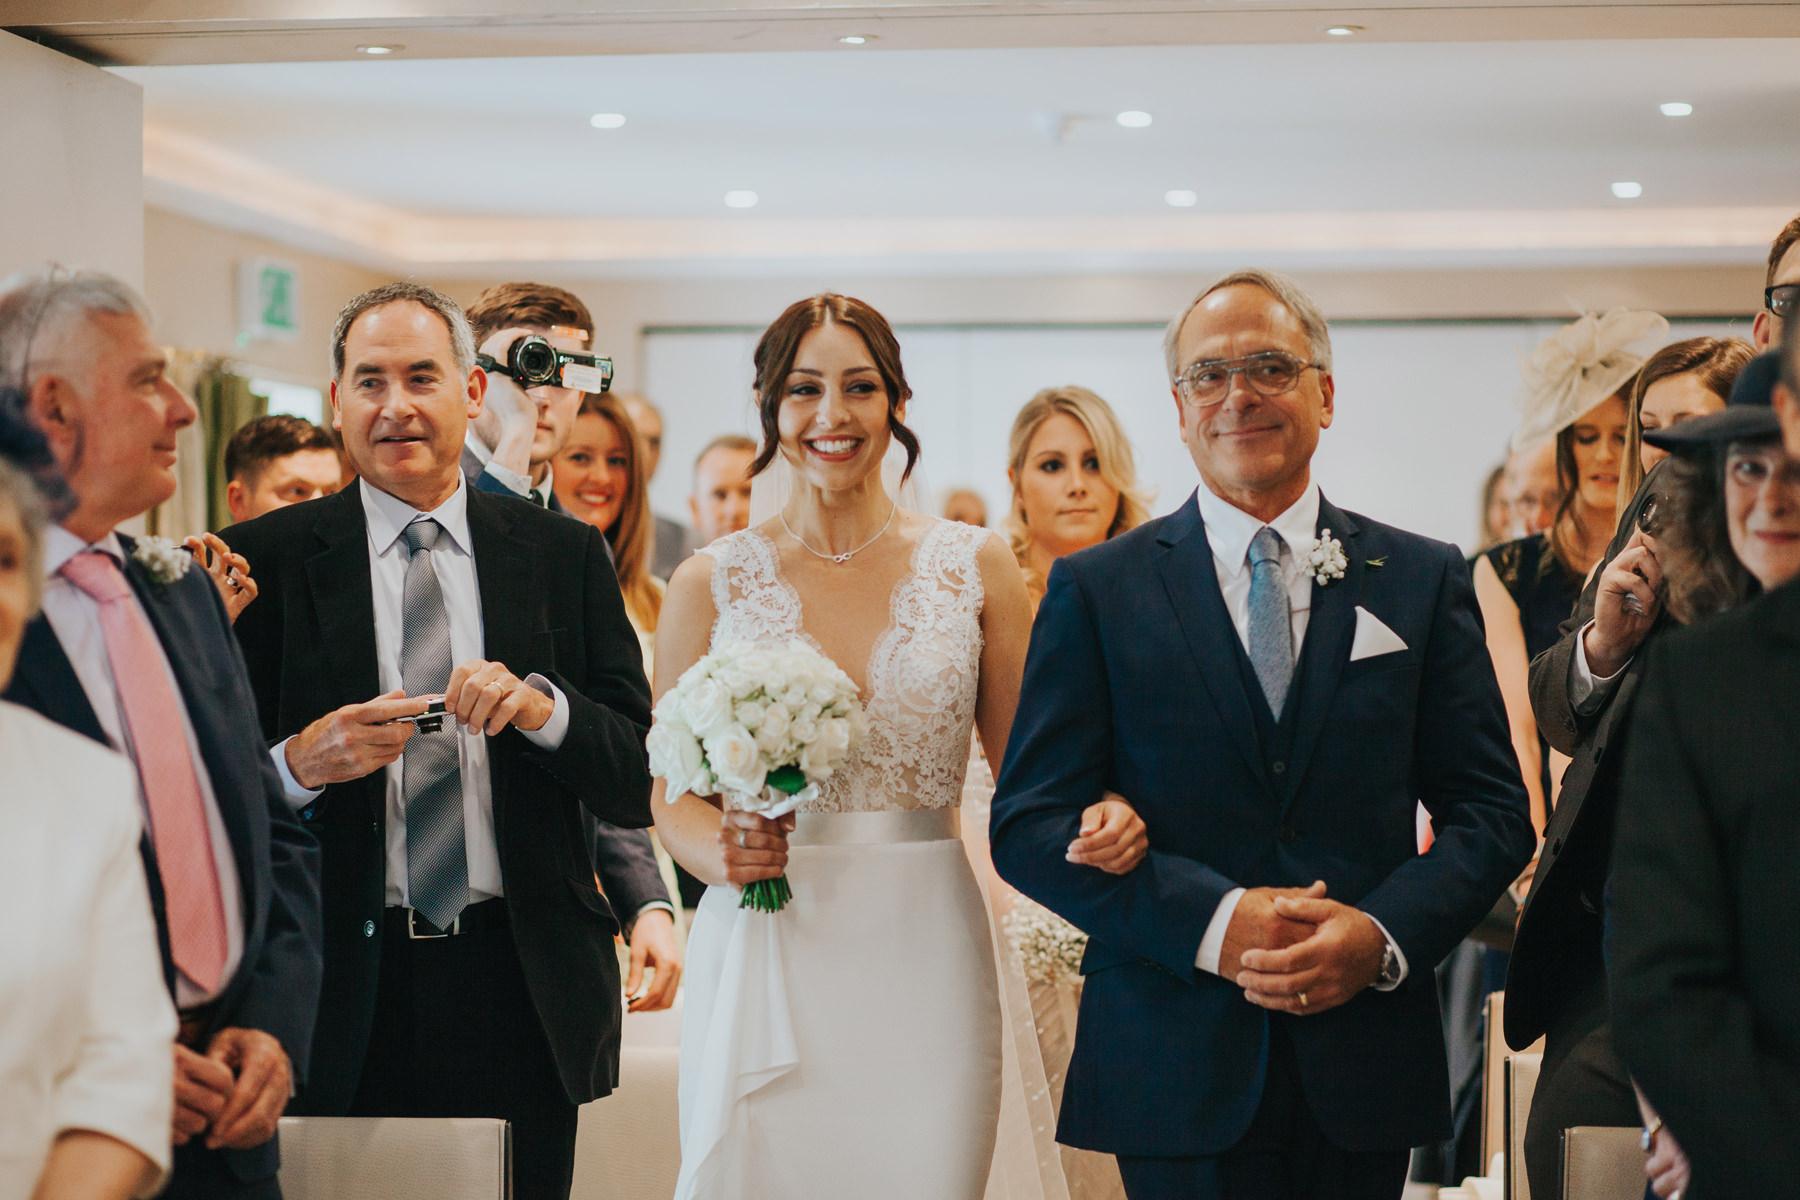 The Bingham Wedding Photographer London--groom waiting bride coming down aisle-CRL-129.jpg